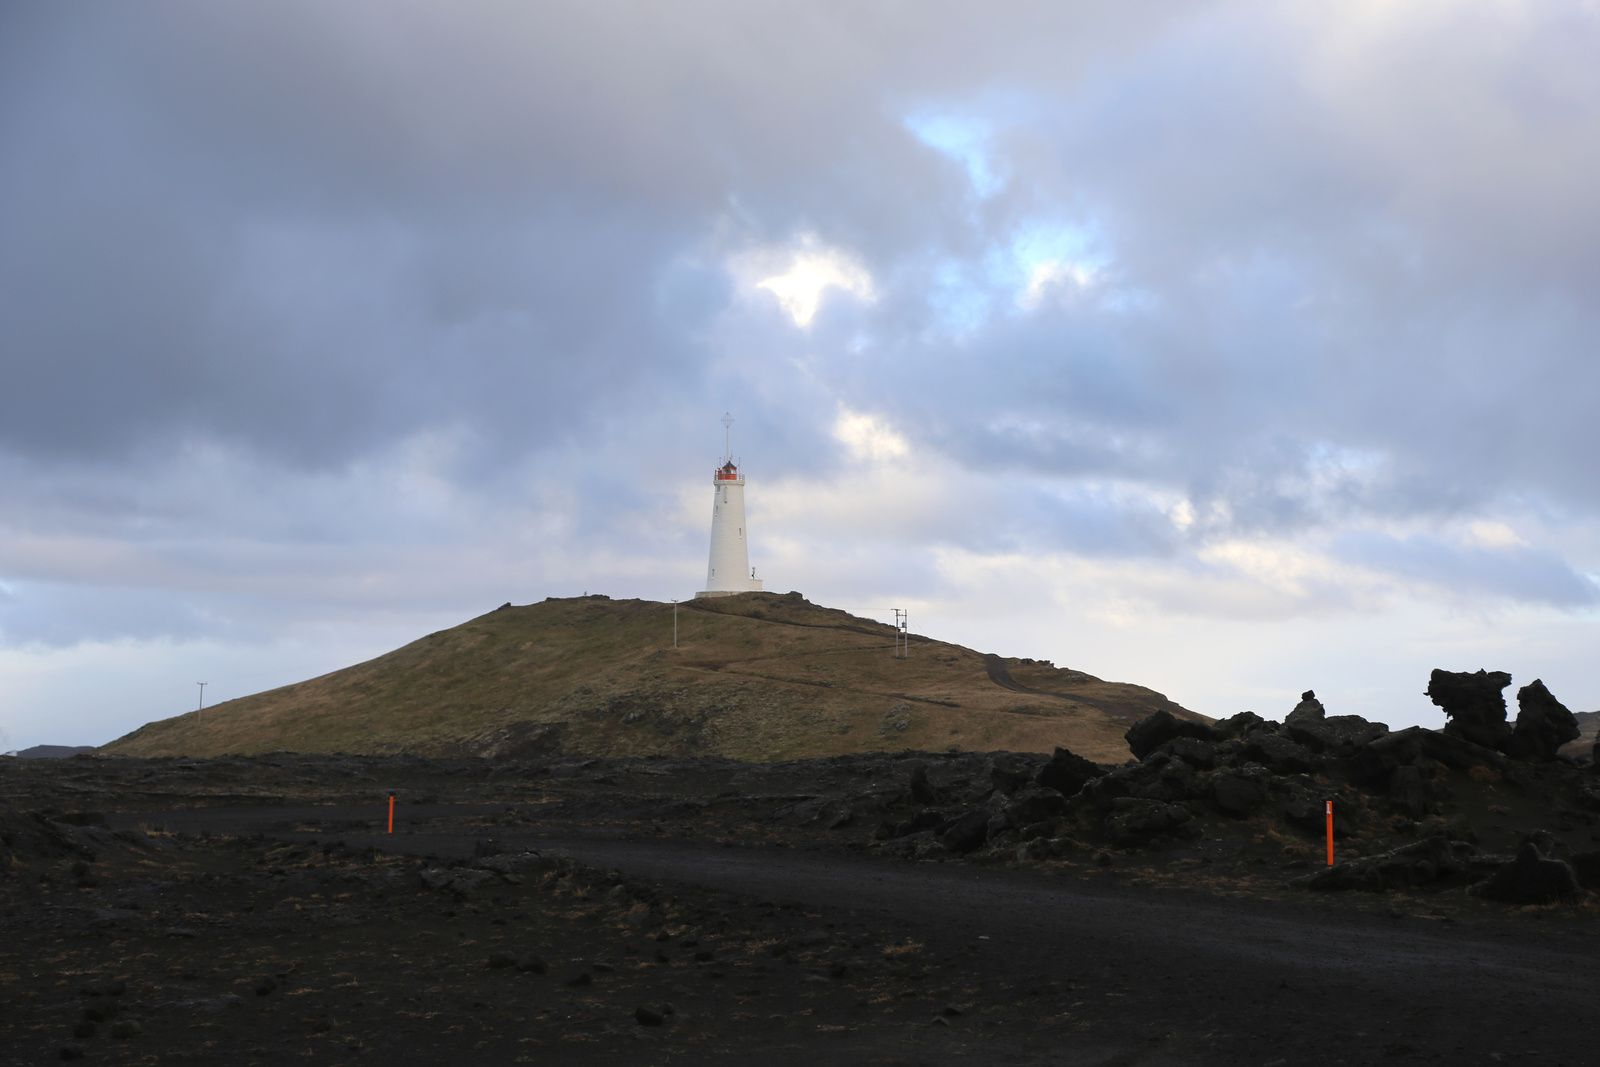 Le phare de Reykjanes -  photo © Bernard Duyck 10.2016